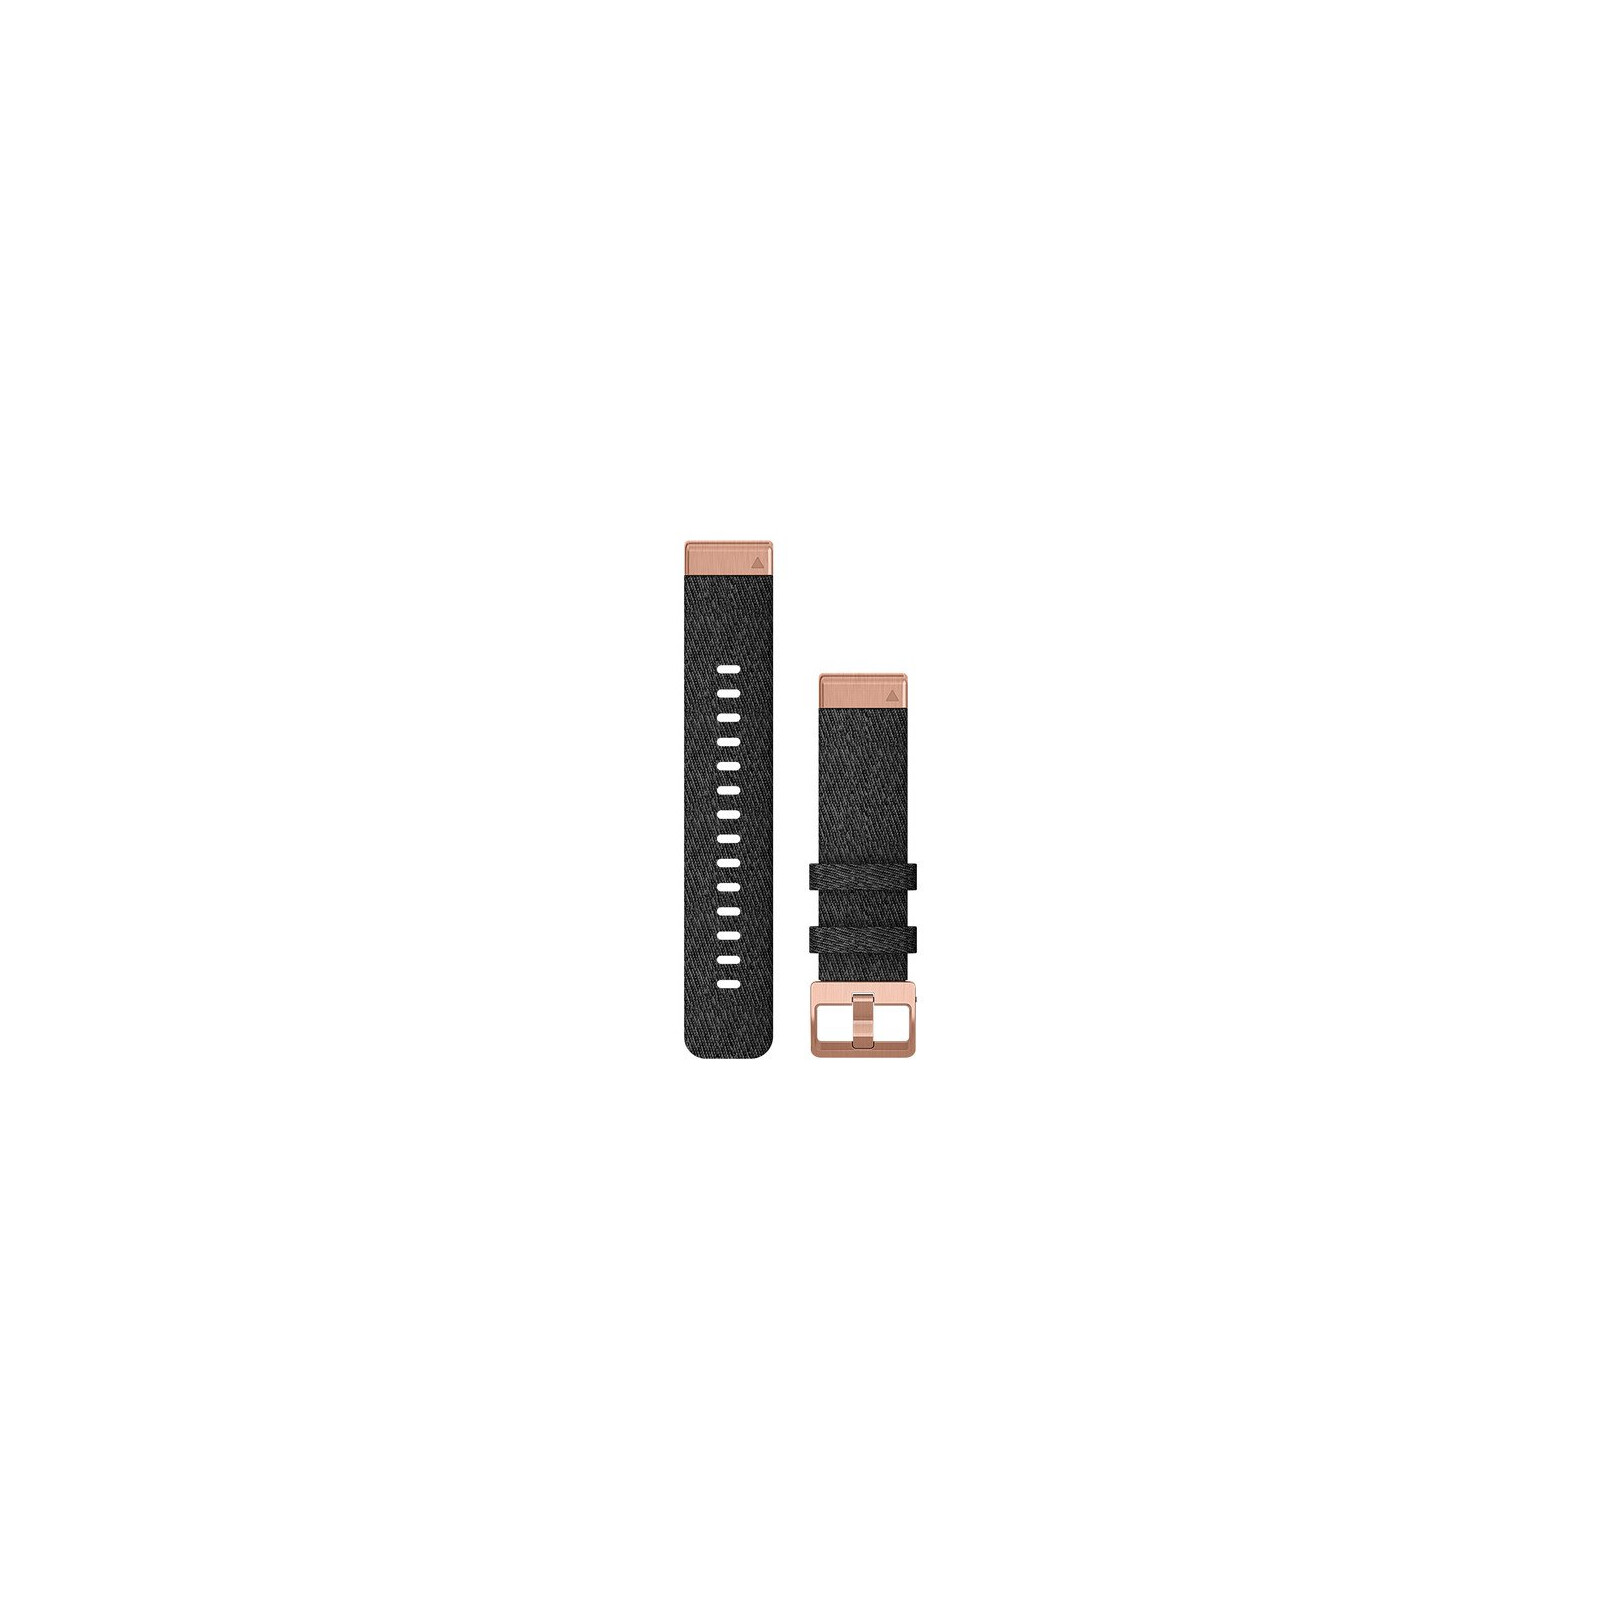 Garmin Quickfit Band 20mm Nylon schwarz meliert Rosegold